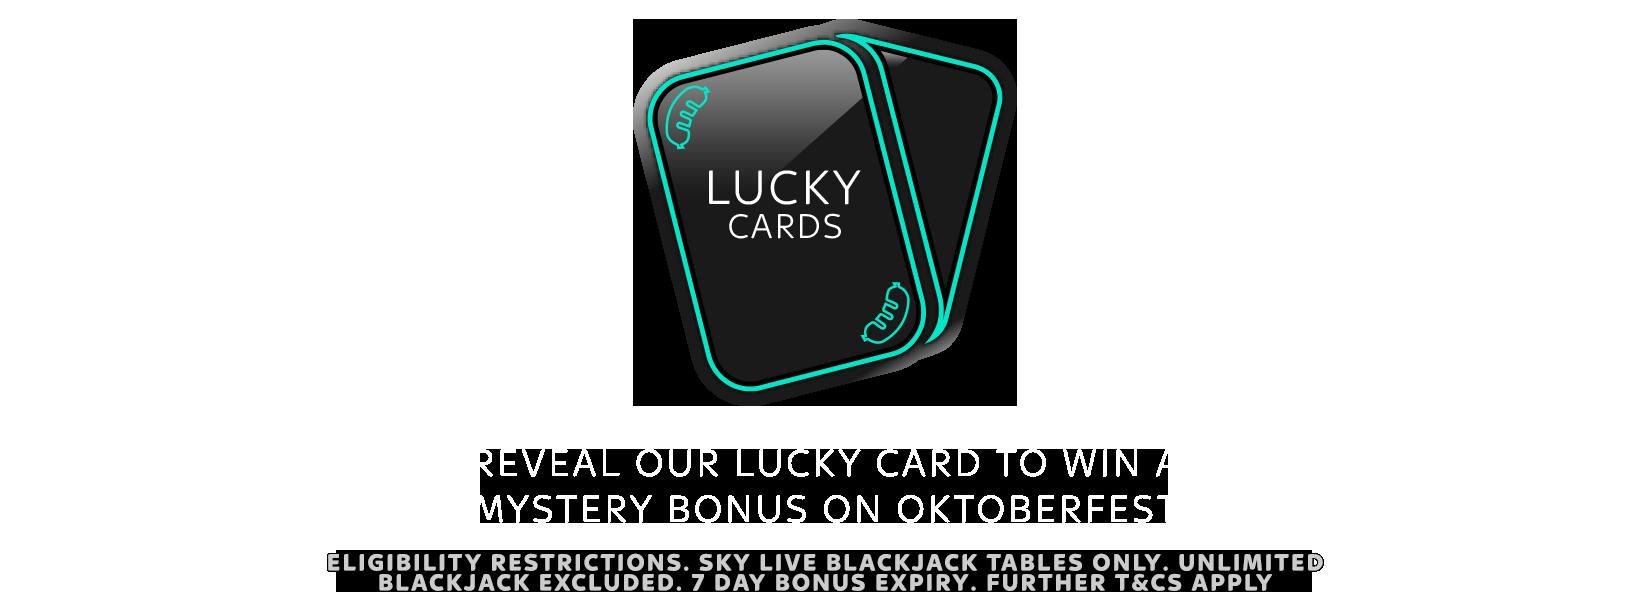 C.L.Oktoberfest.Luckycards